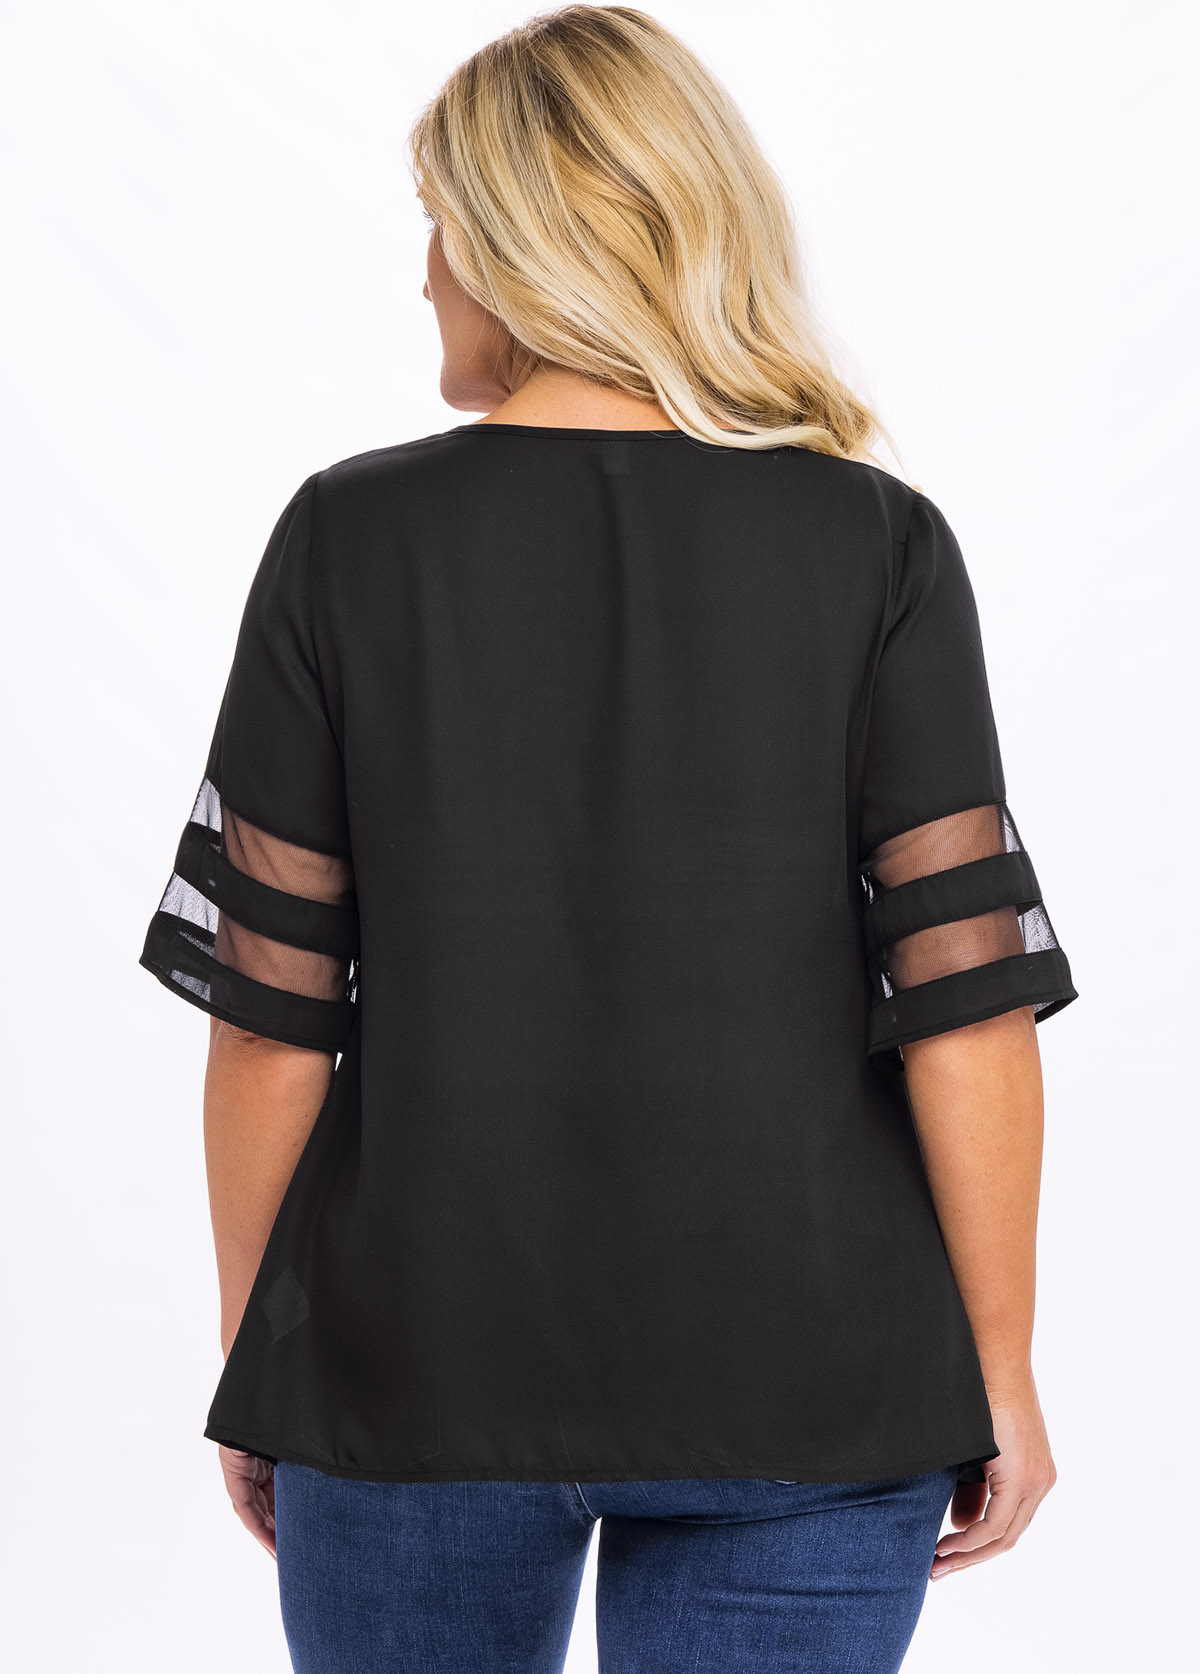 V Neck Plus Size Mesh Stitching T Shirt